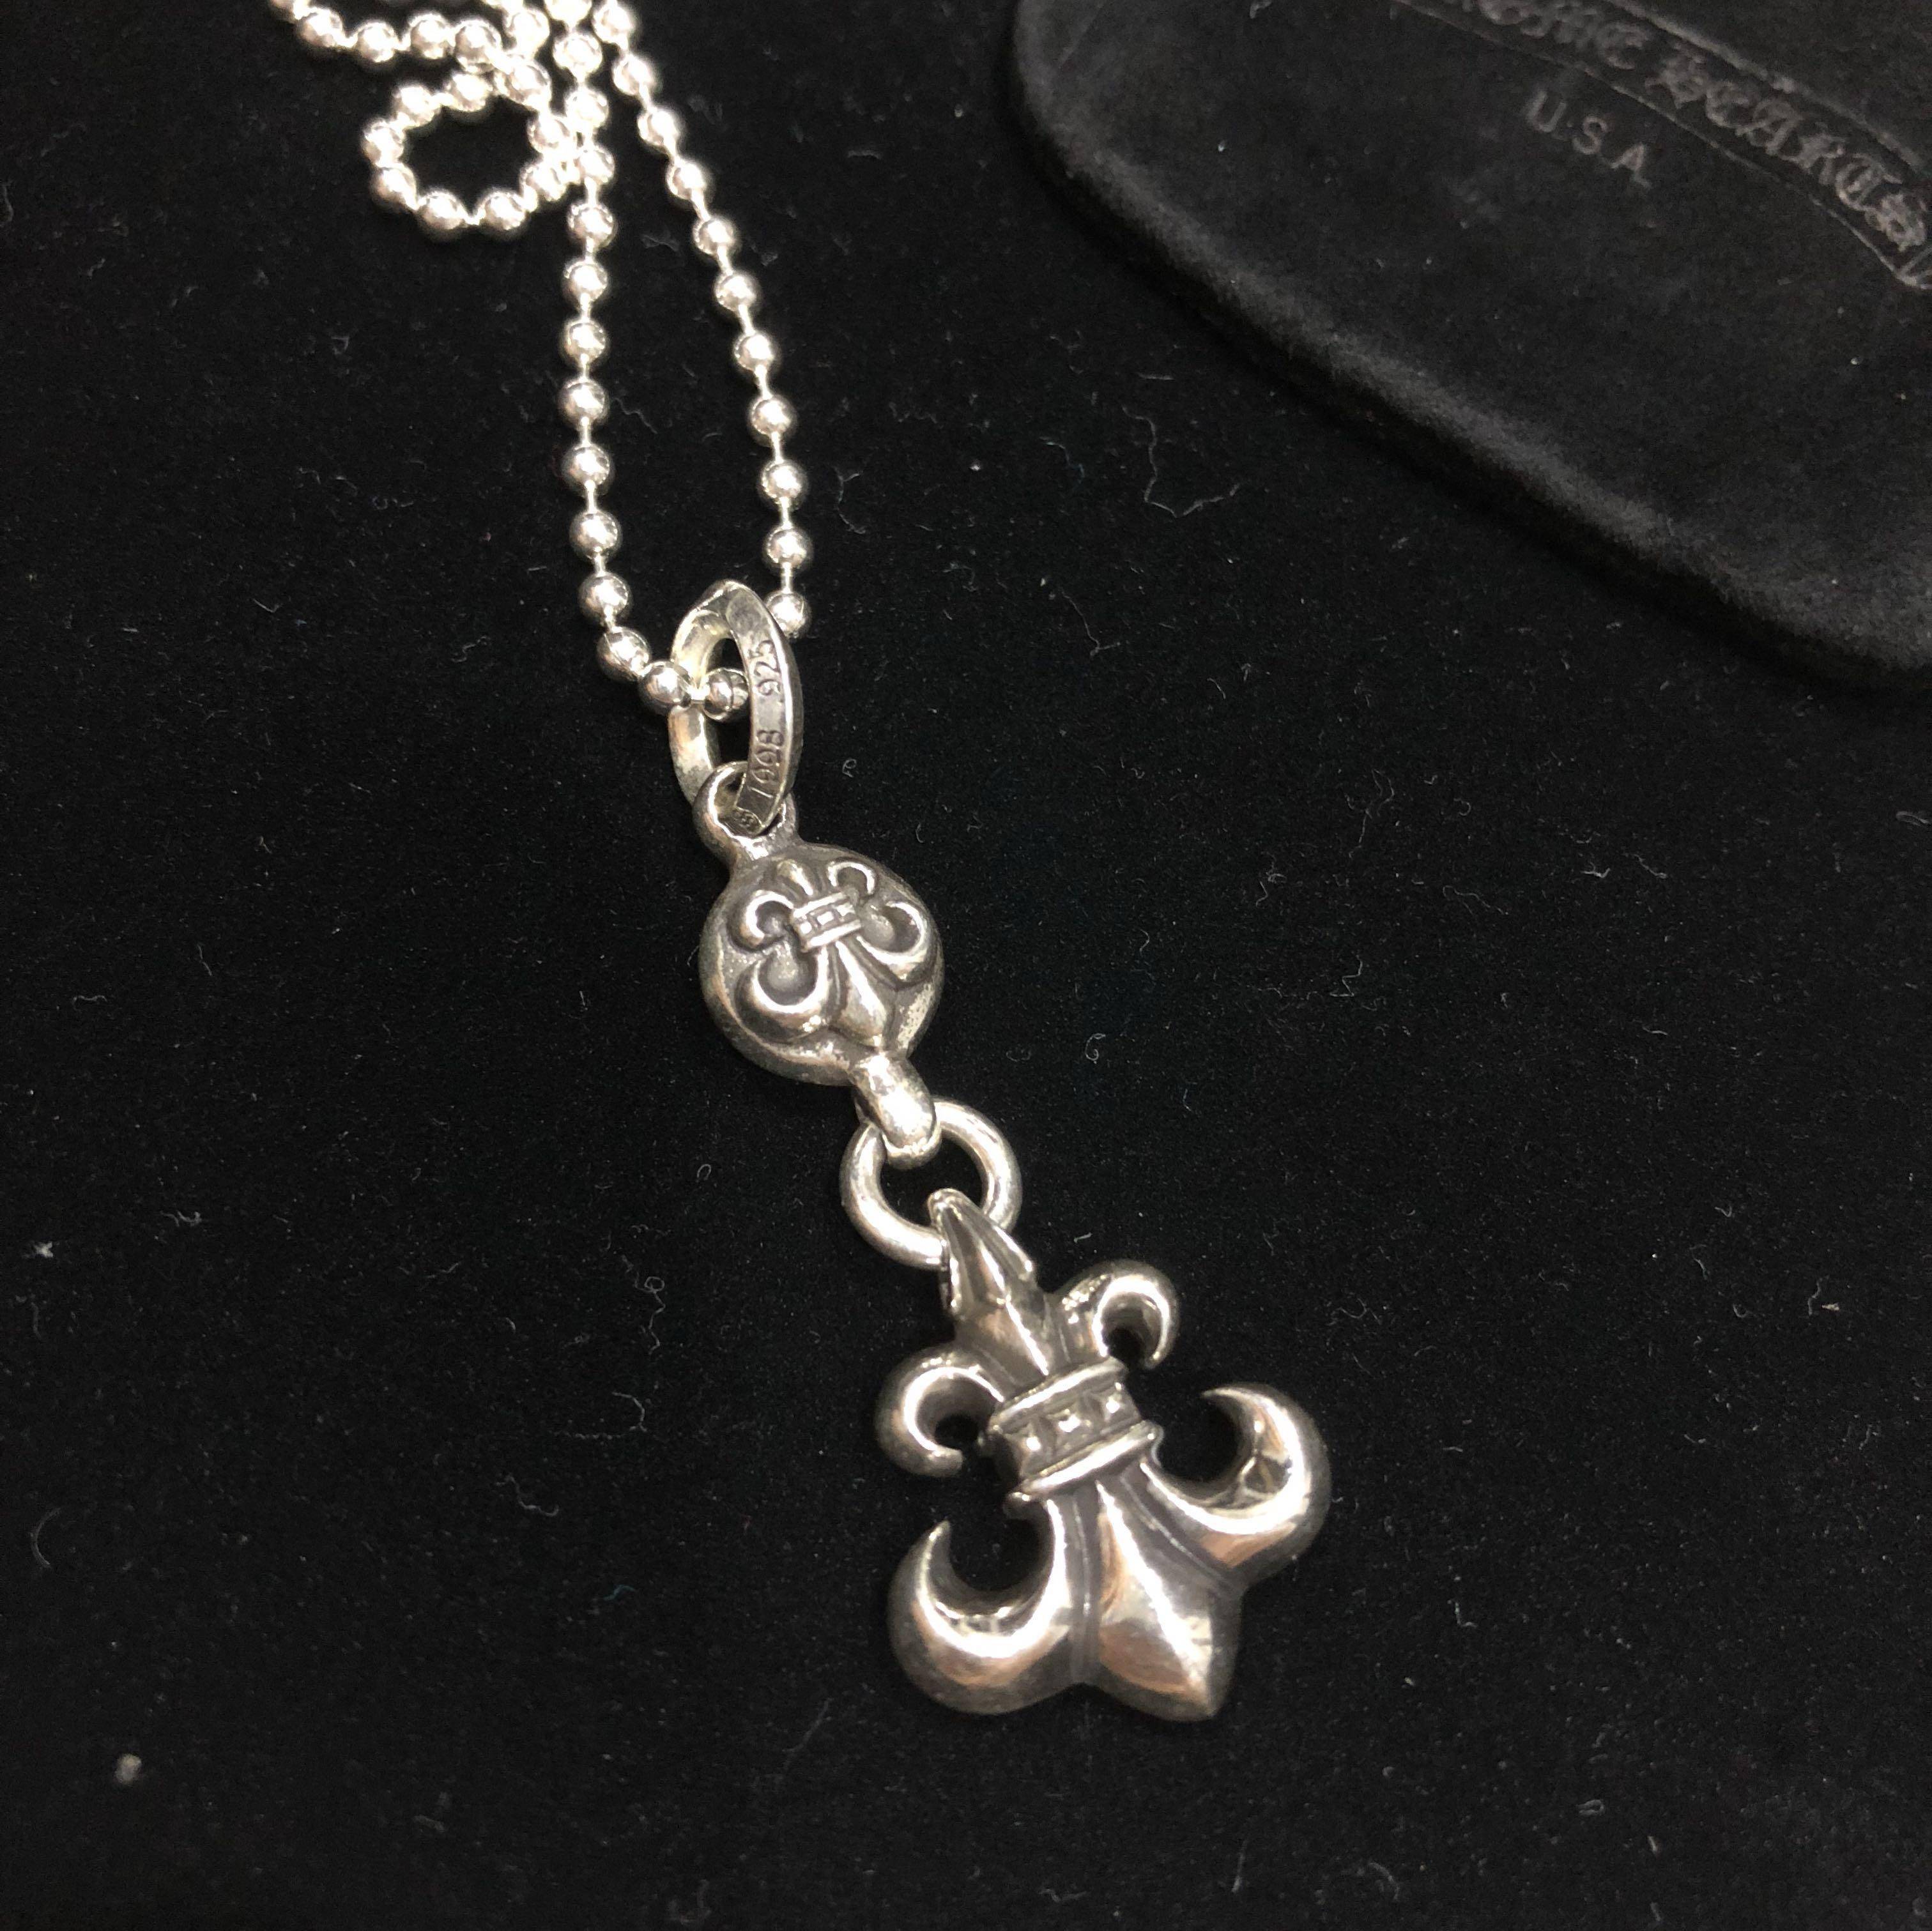 a329c673d65f Chrome Hearts 925 silver Fleur De Lis Pendant with ball chain ...